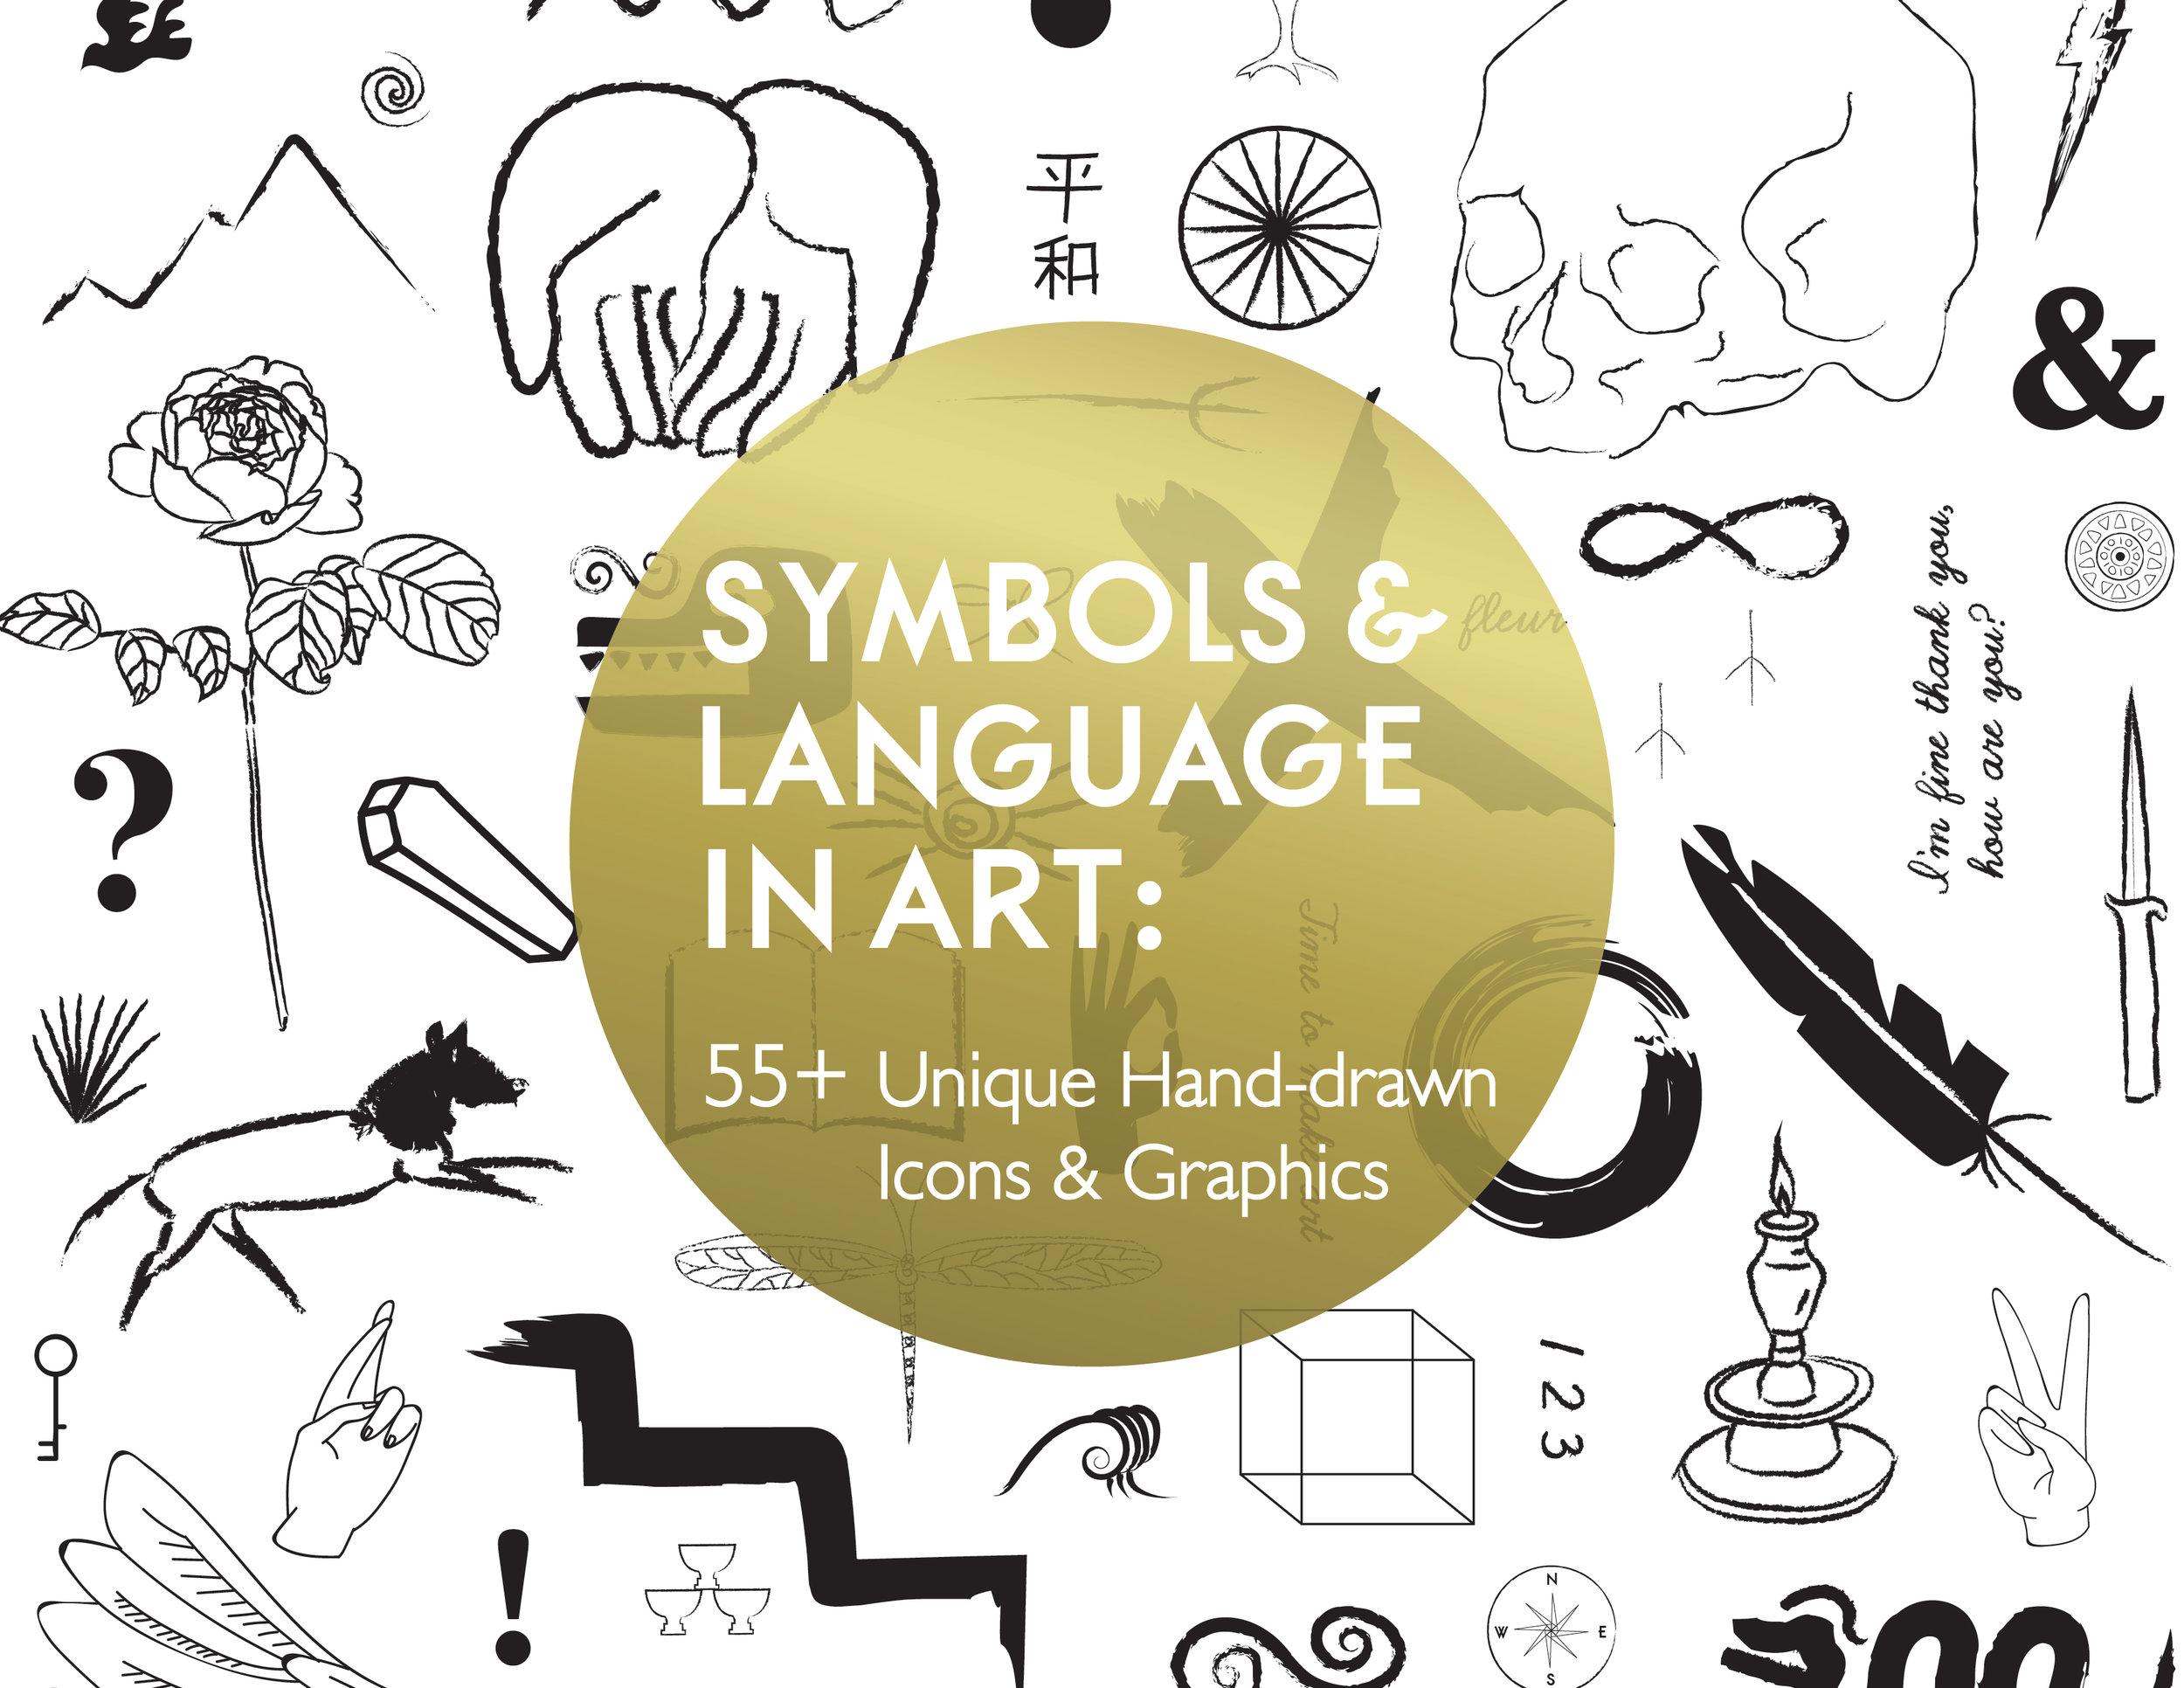 Symbols&Languageinart-Oct2018-01.jpg